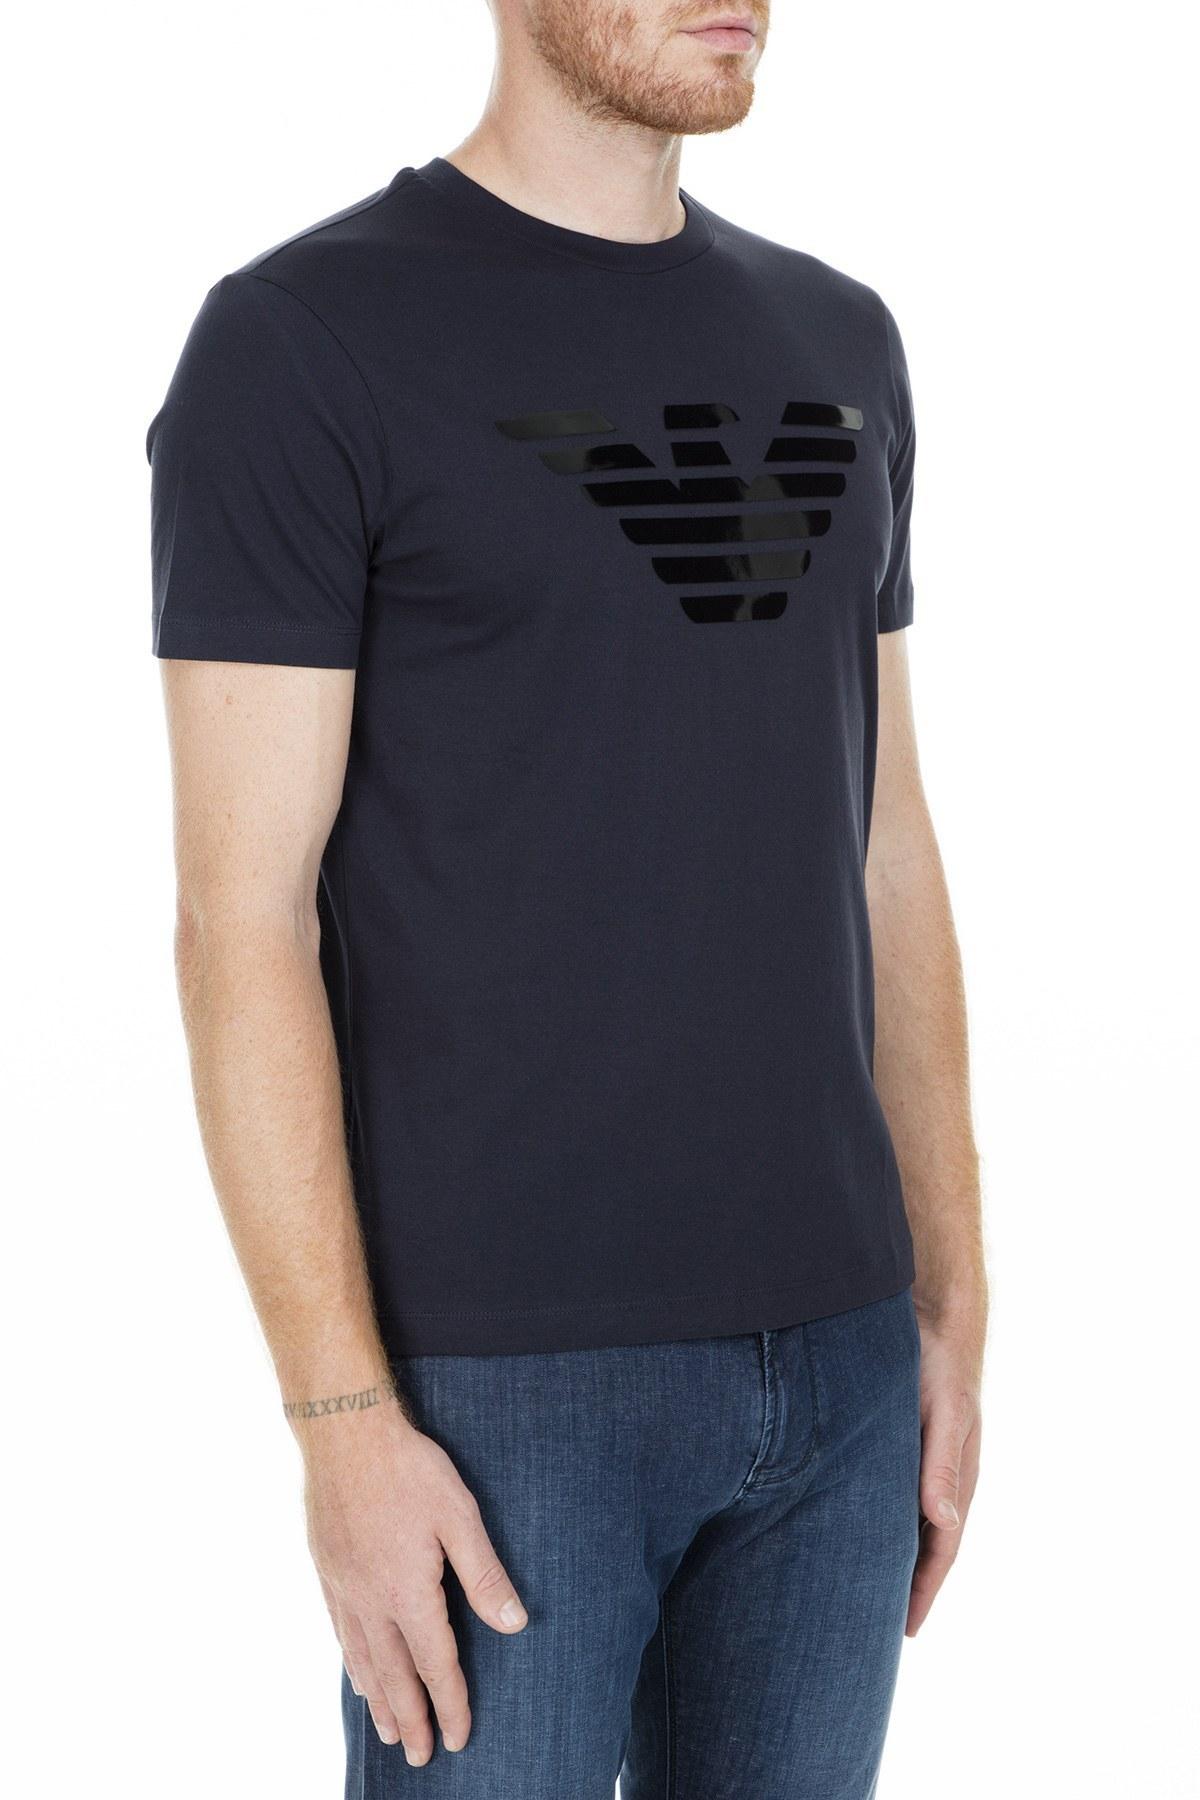 Emporio Armani Erkek T Shirt S 3G1T92 1J00Z 0924 LACİVERT